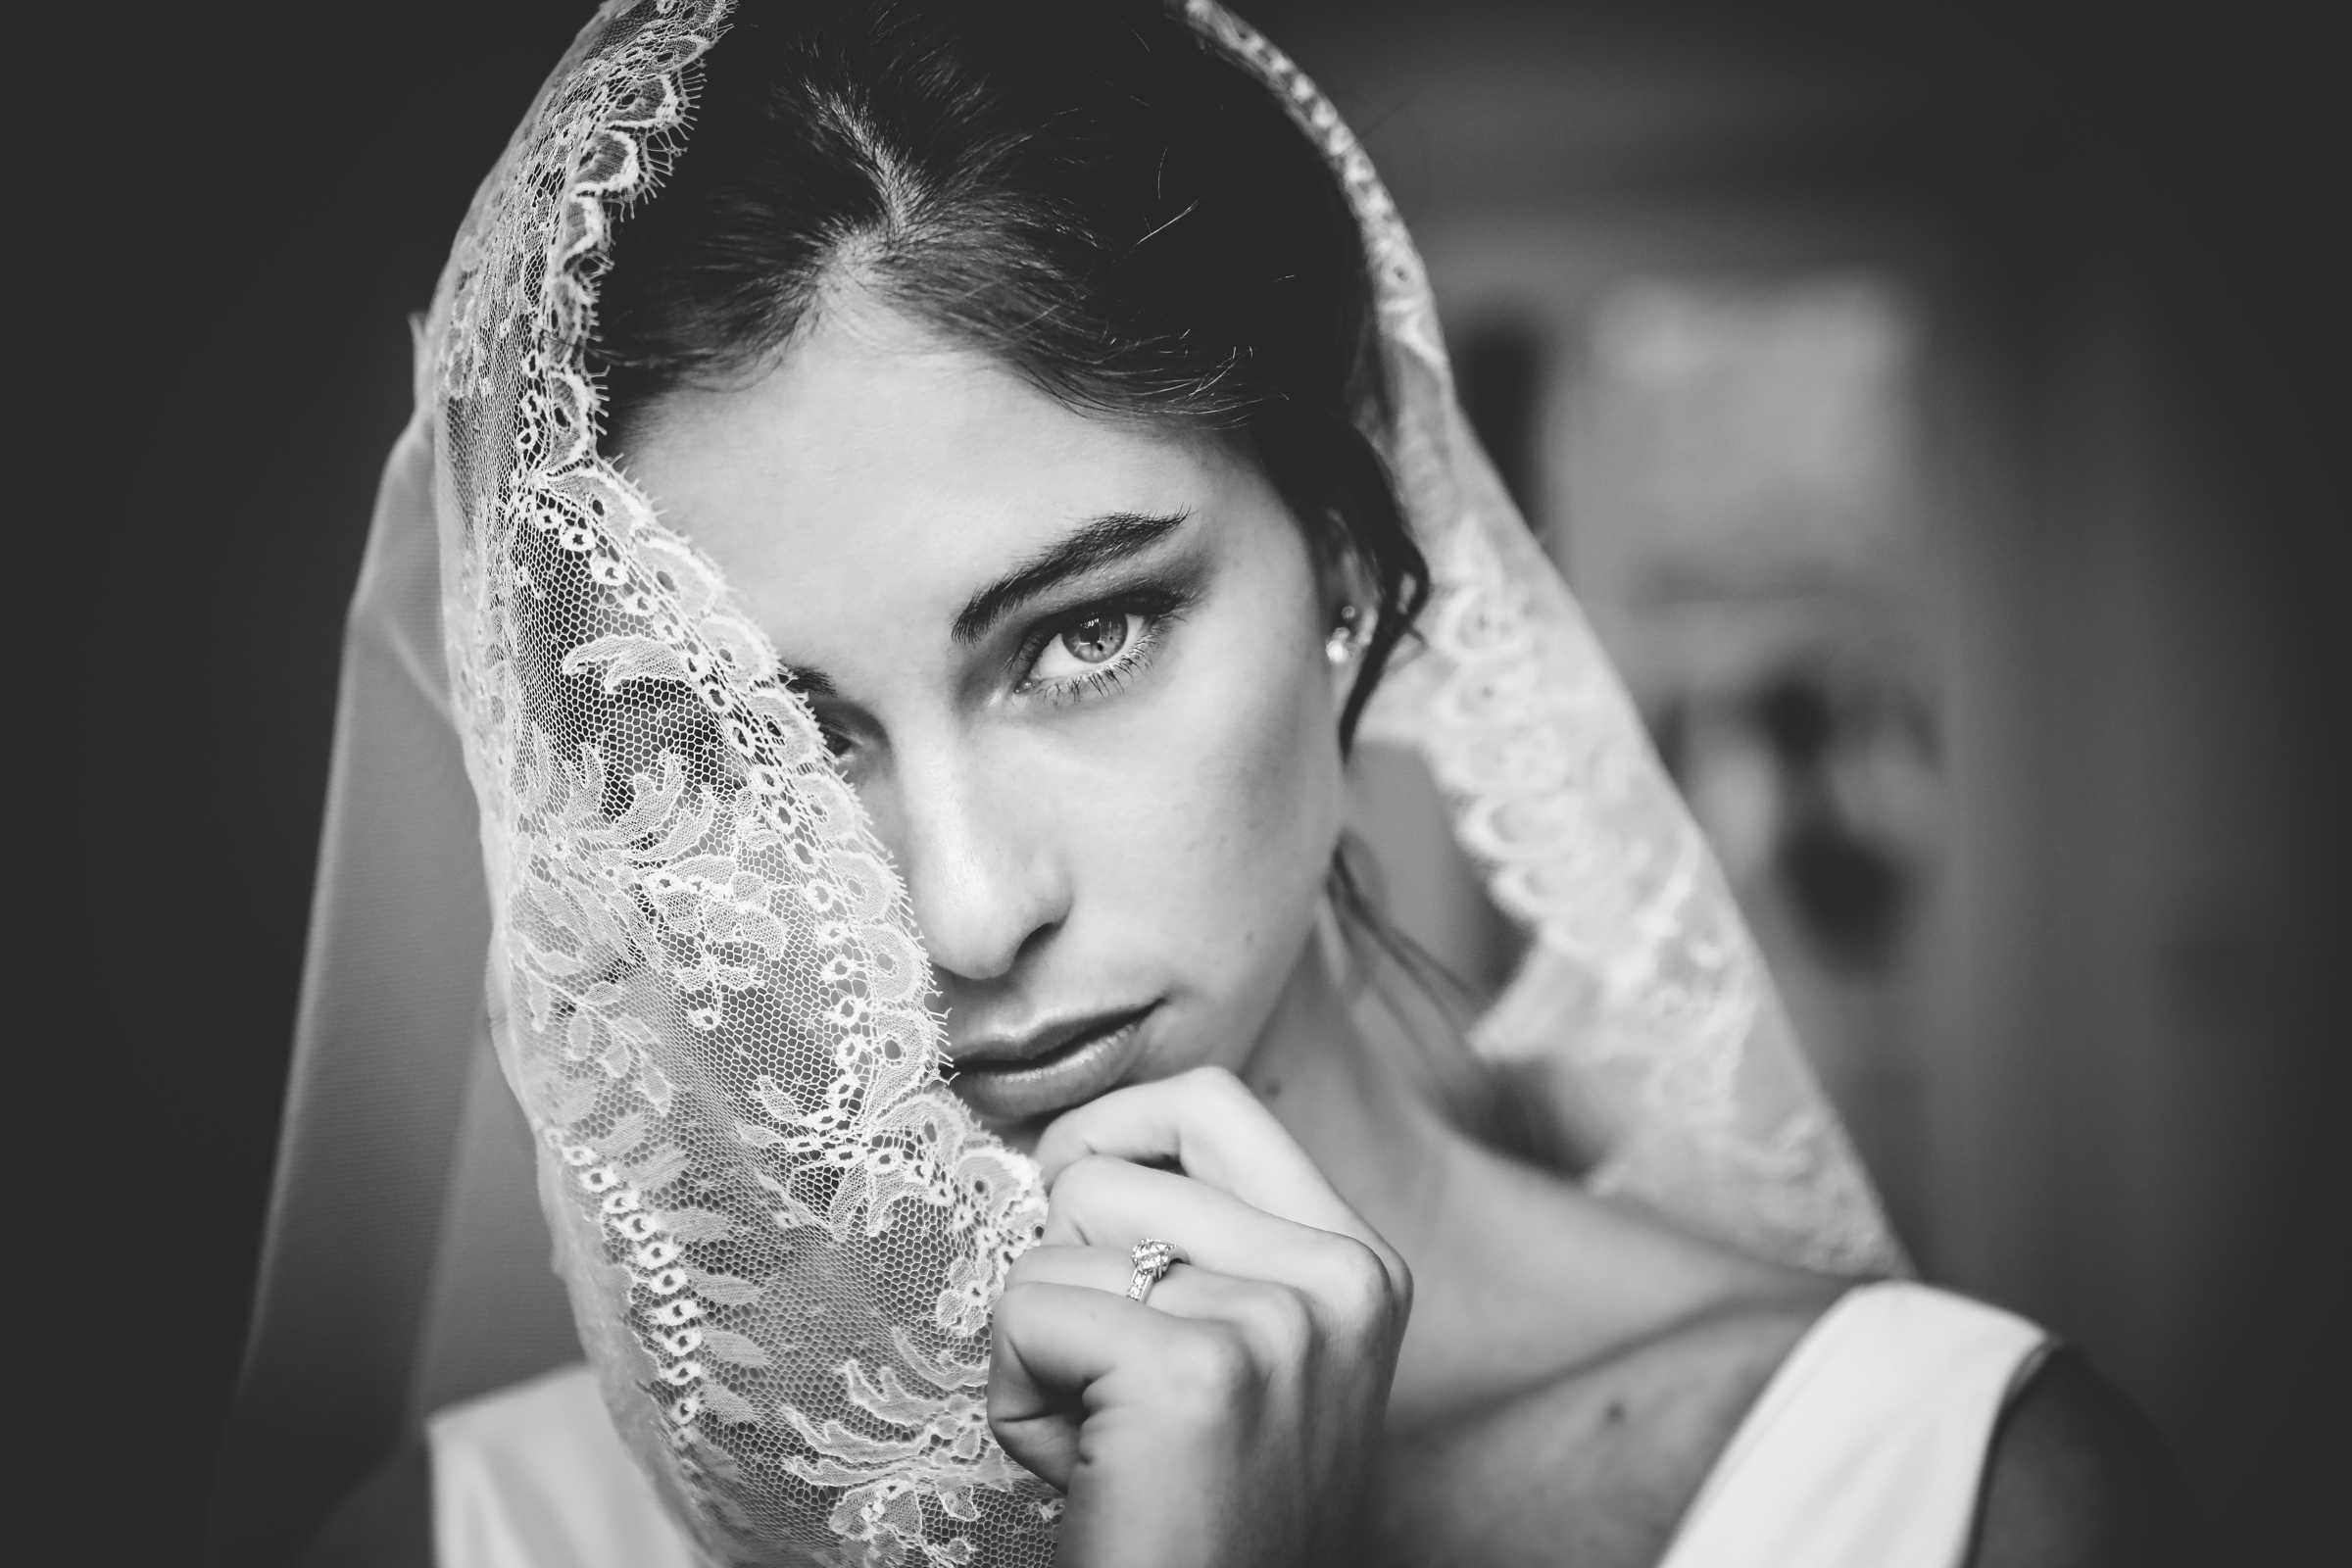 Portrait of bride peeking from behind veil - photo by Julien Laurent-Georges